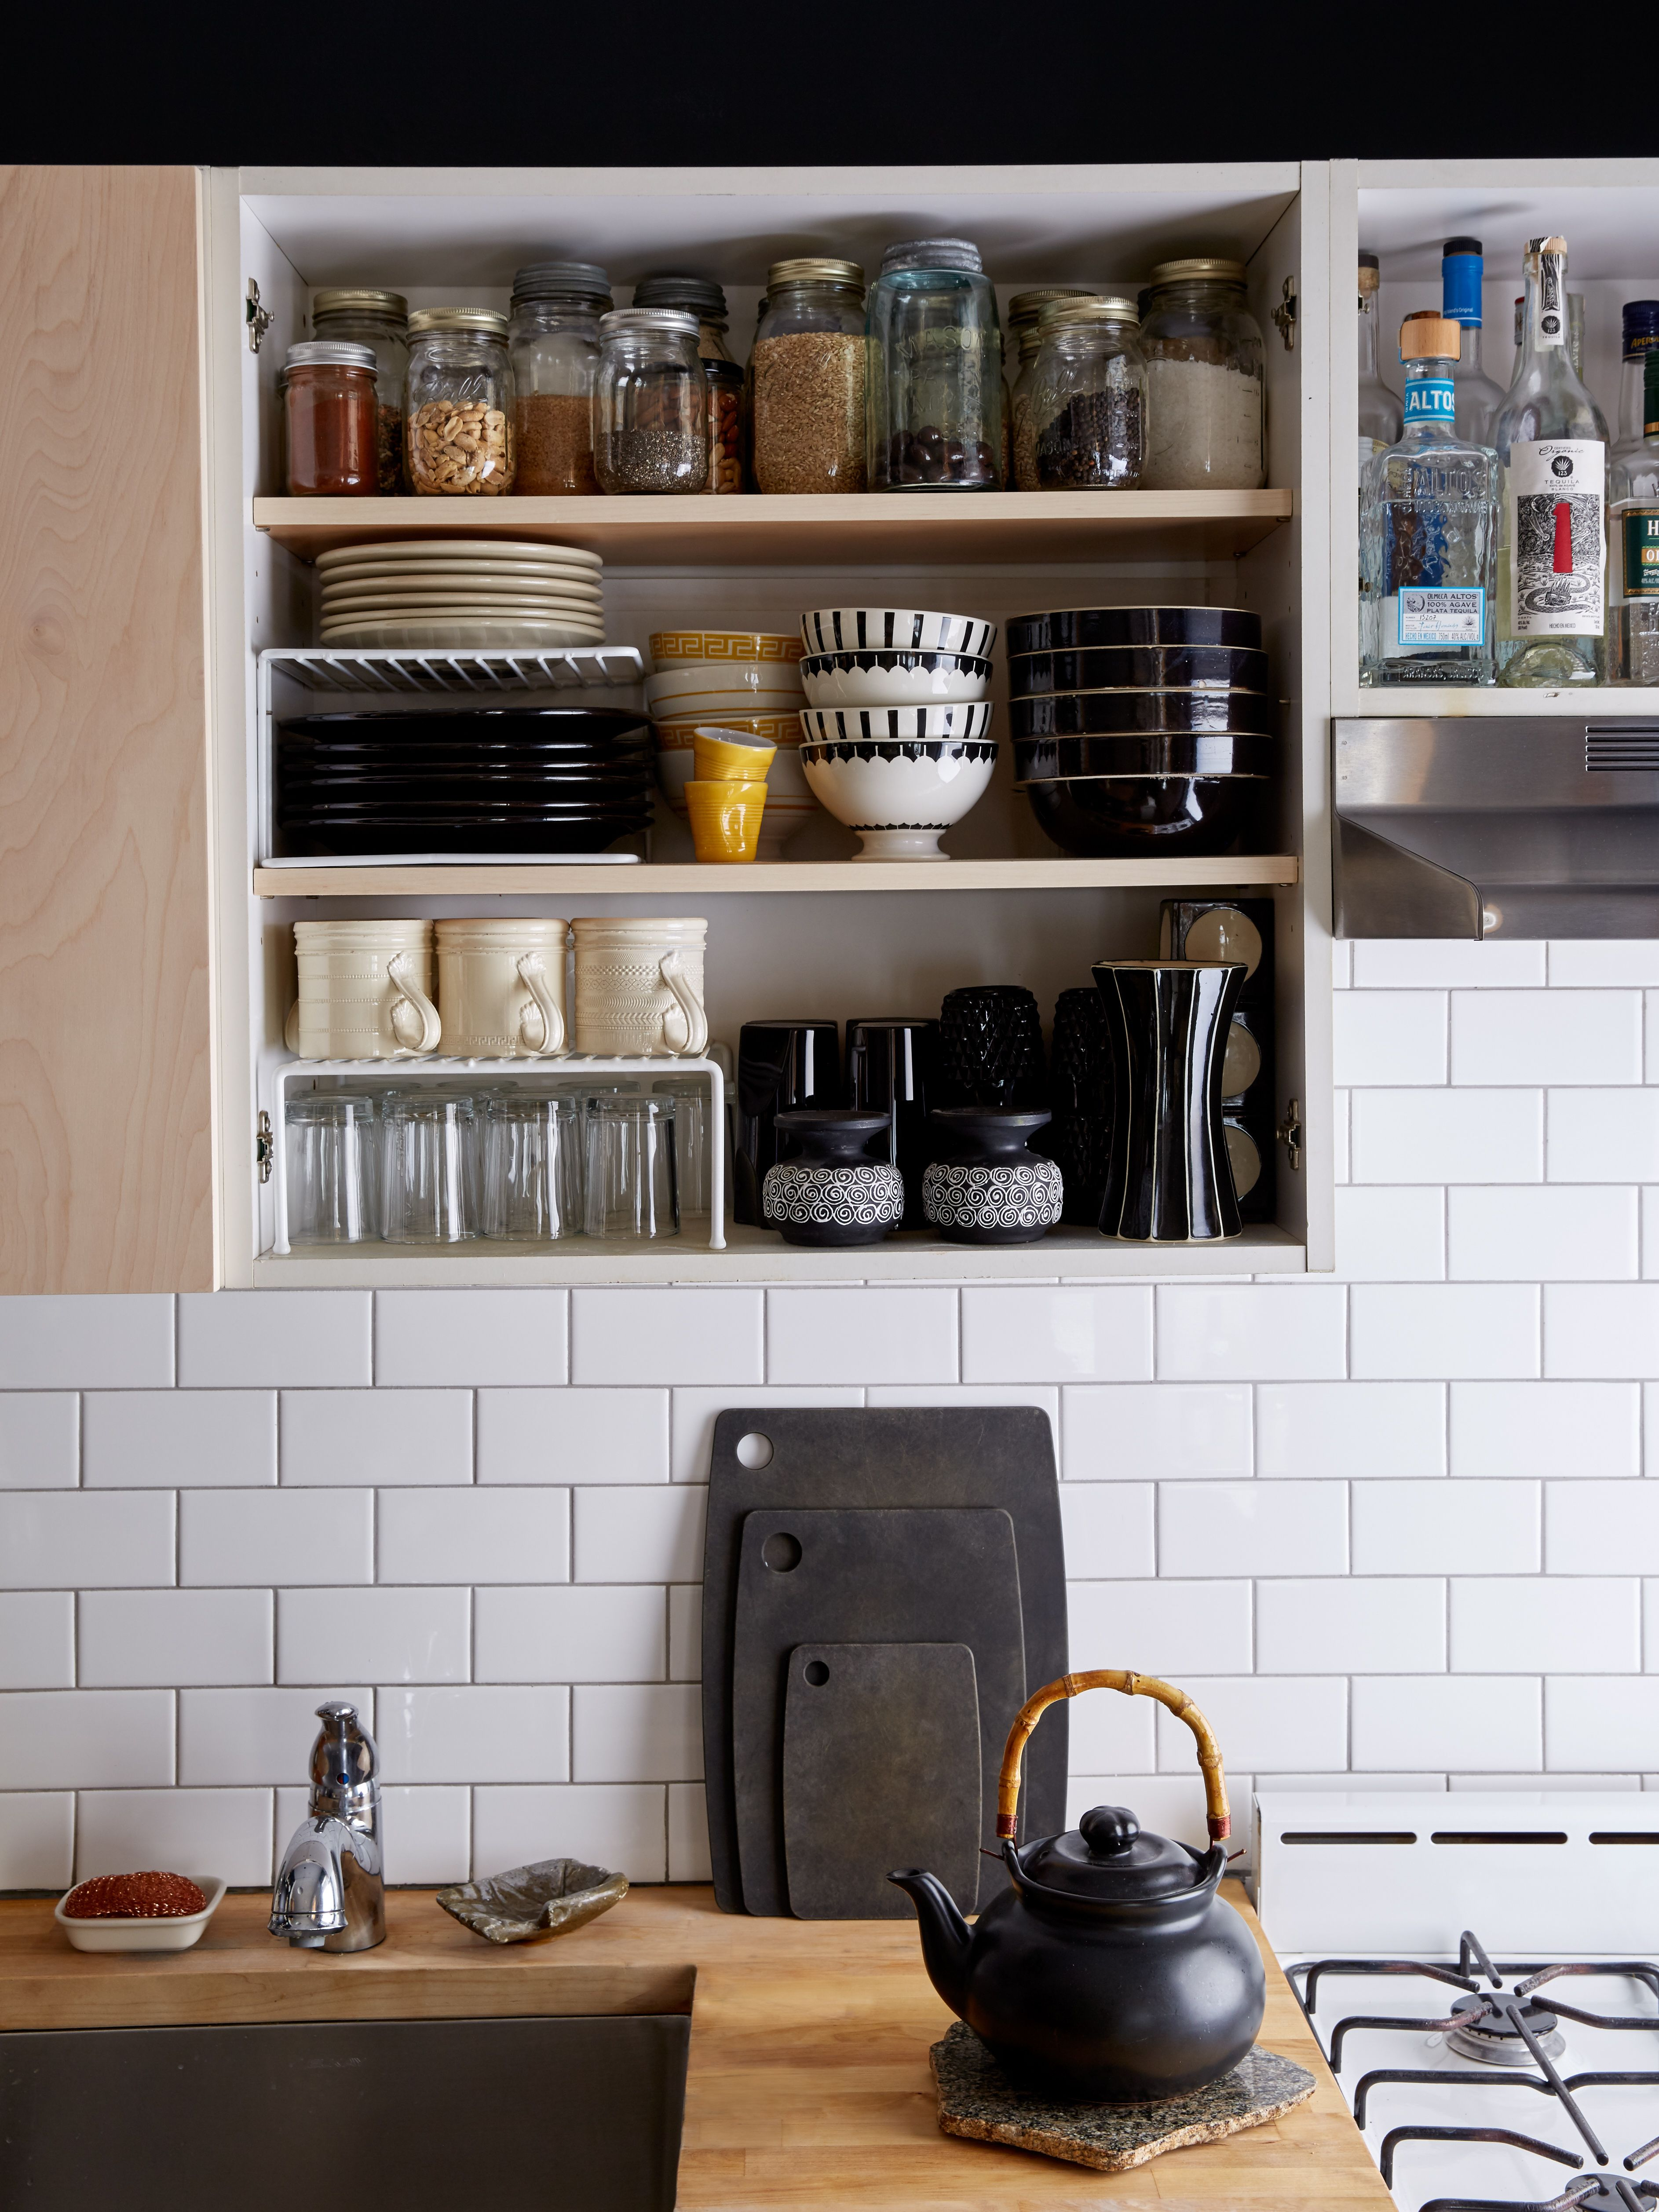 Open kitchen shelving and white subway tile backsplash